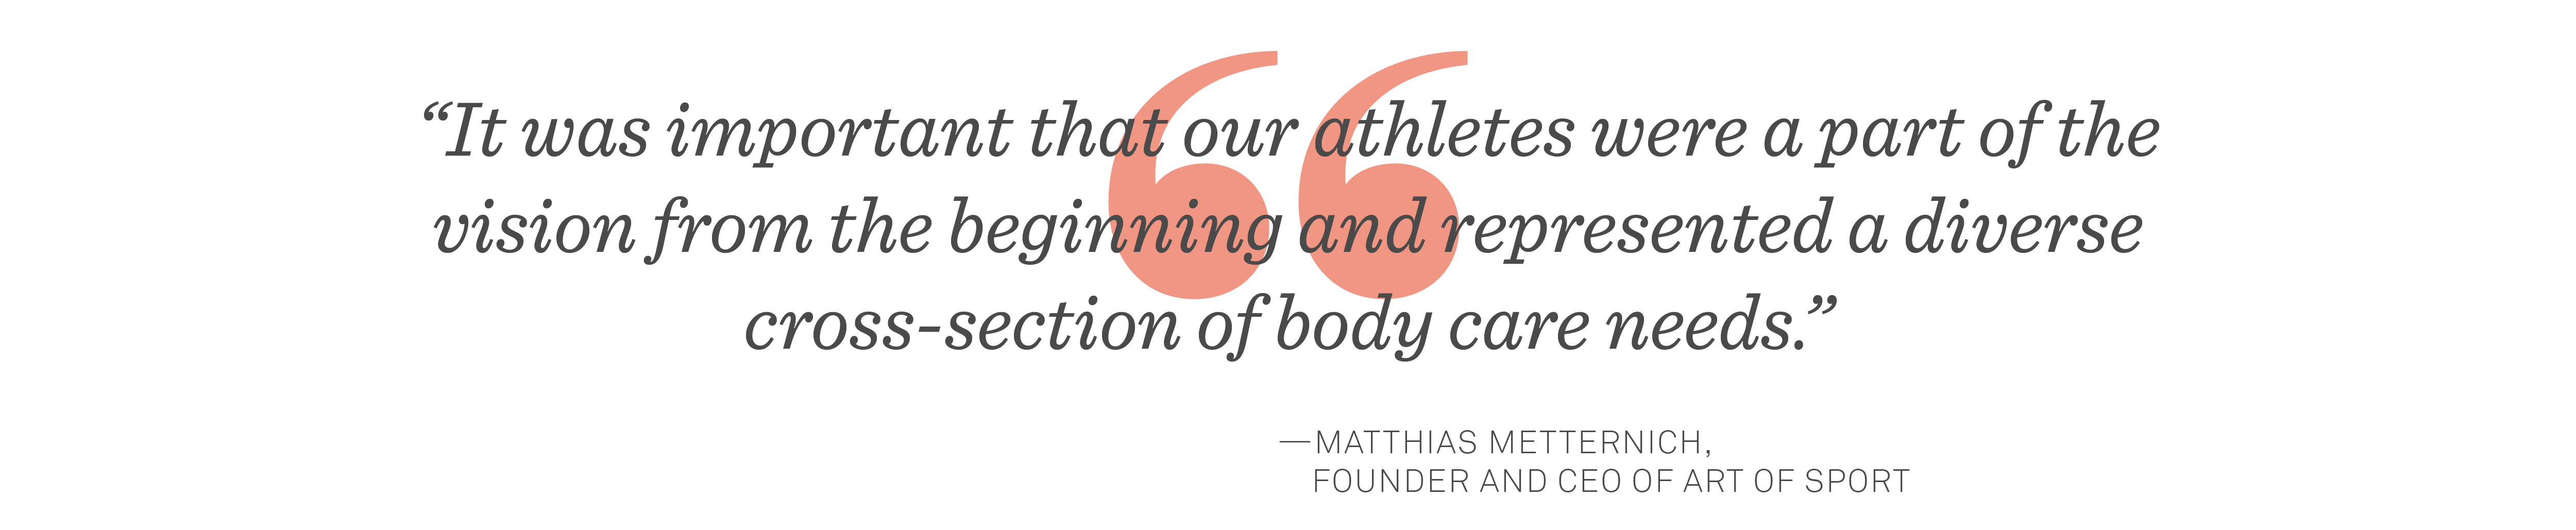 Matthias Metternich quote